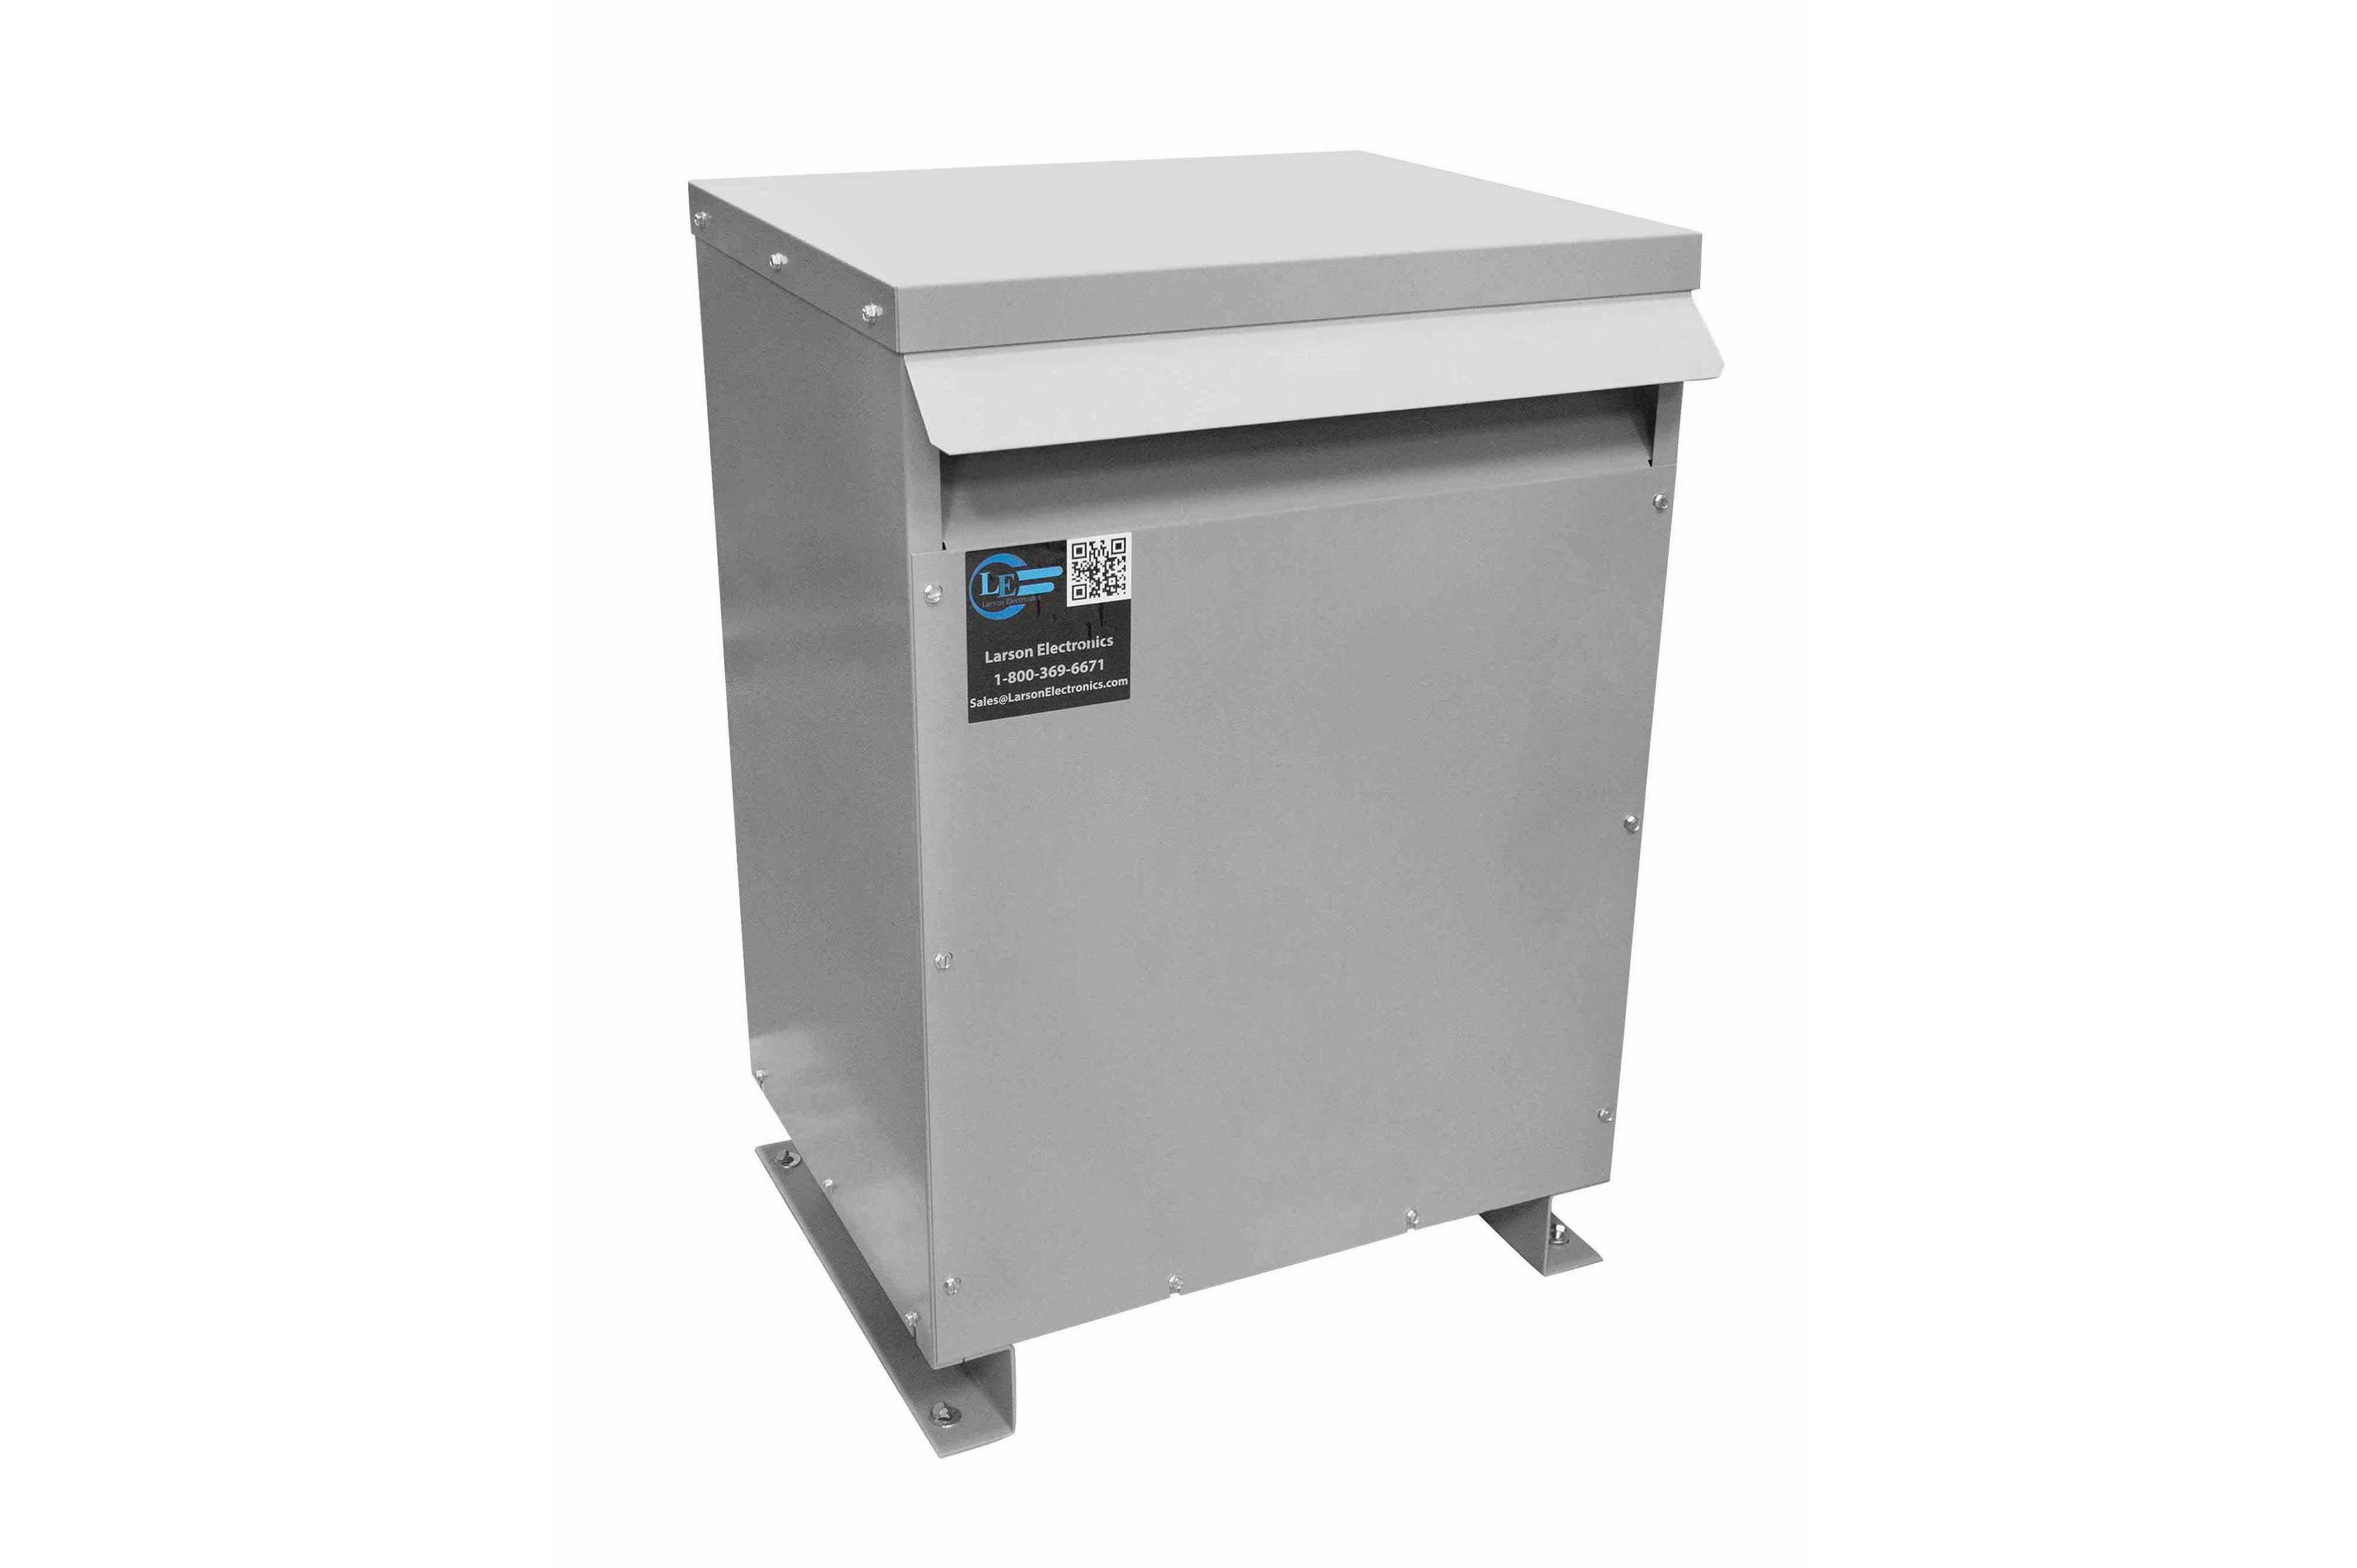 42.5 kVA 3PH Isolation Transformer, 460V Wye Primary, 208V Delta Secondary, N3R, Ventilated, 60 Hz